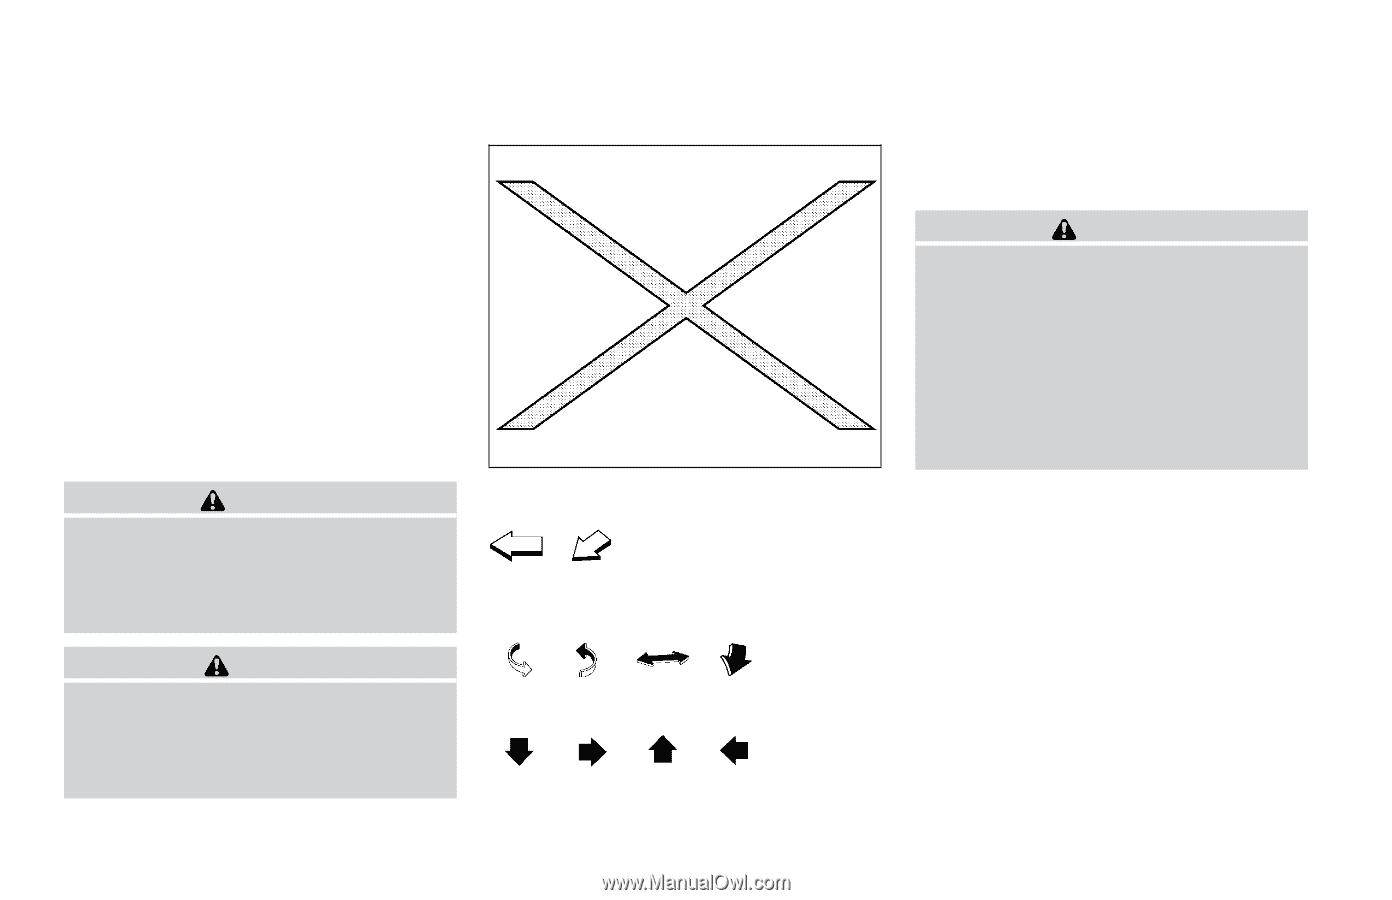 nissan xterra owner manual